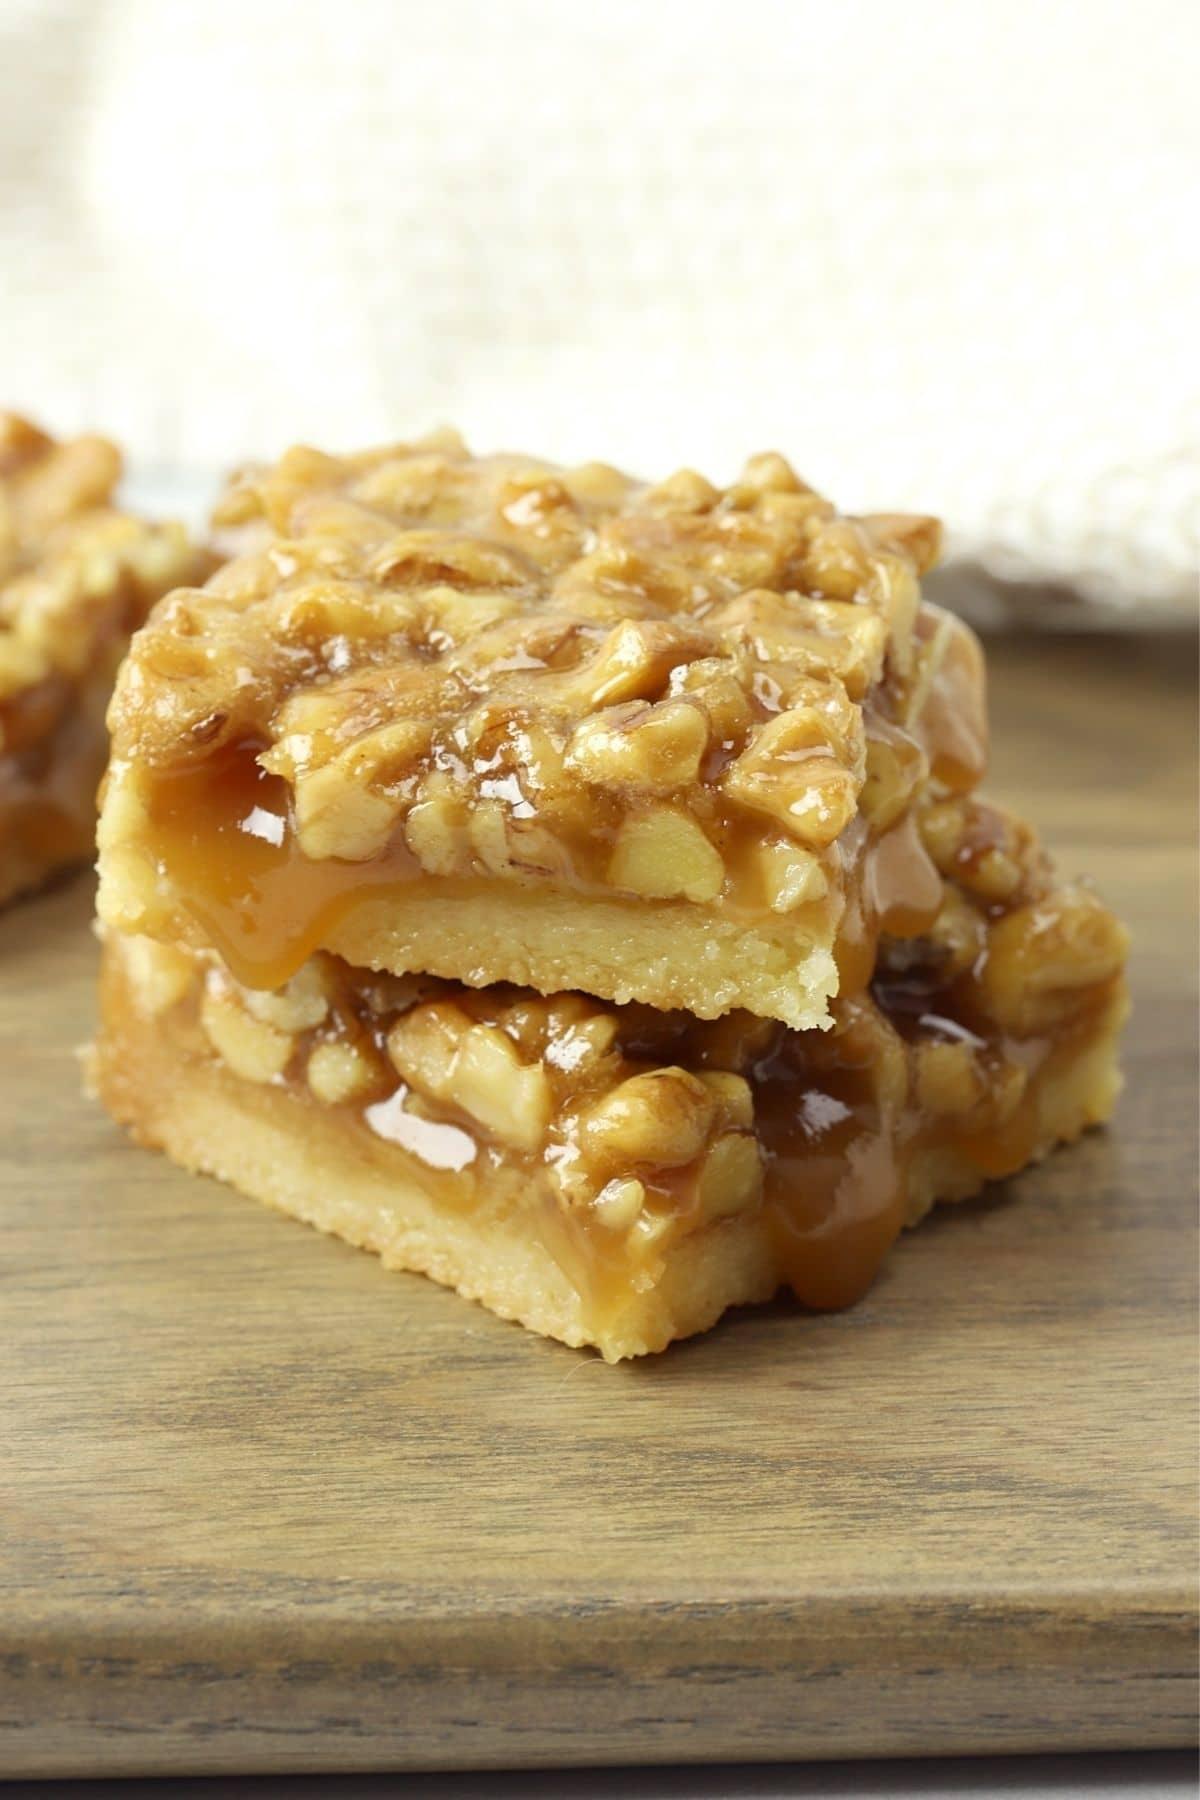 Stack of walnut honey bars on cutting board